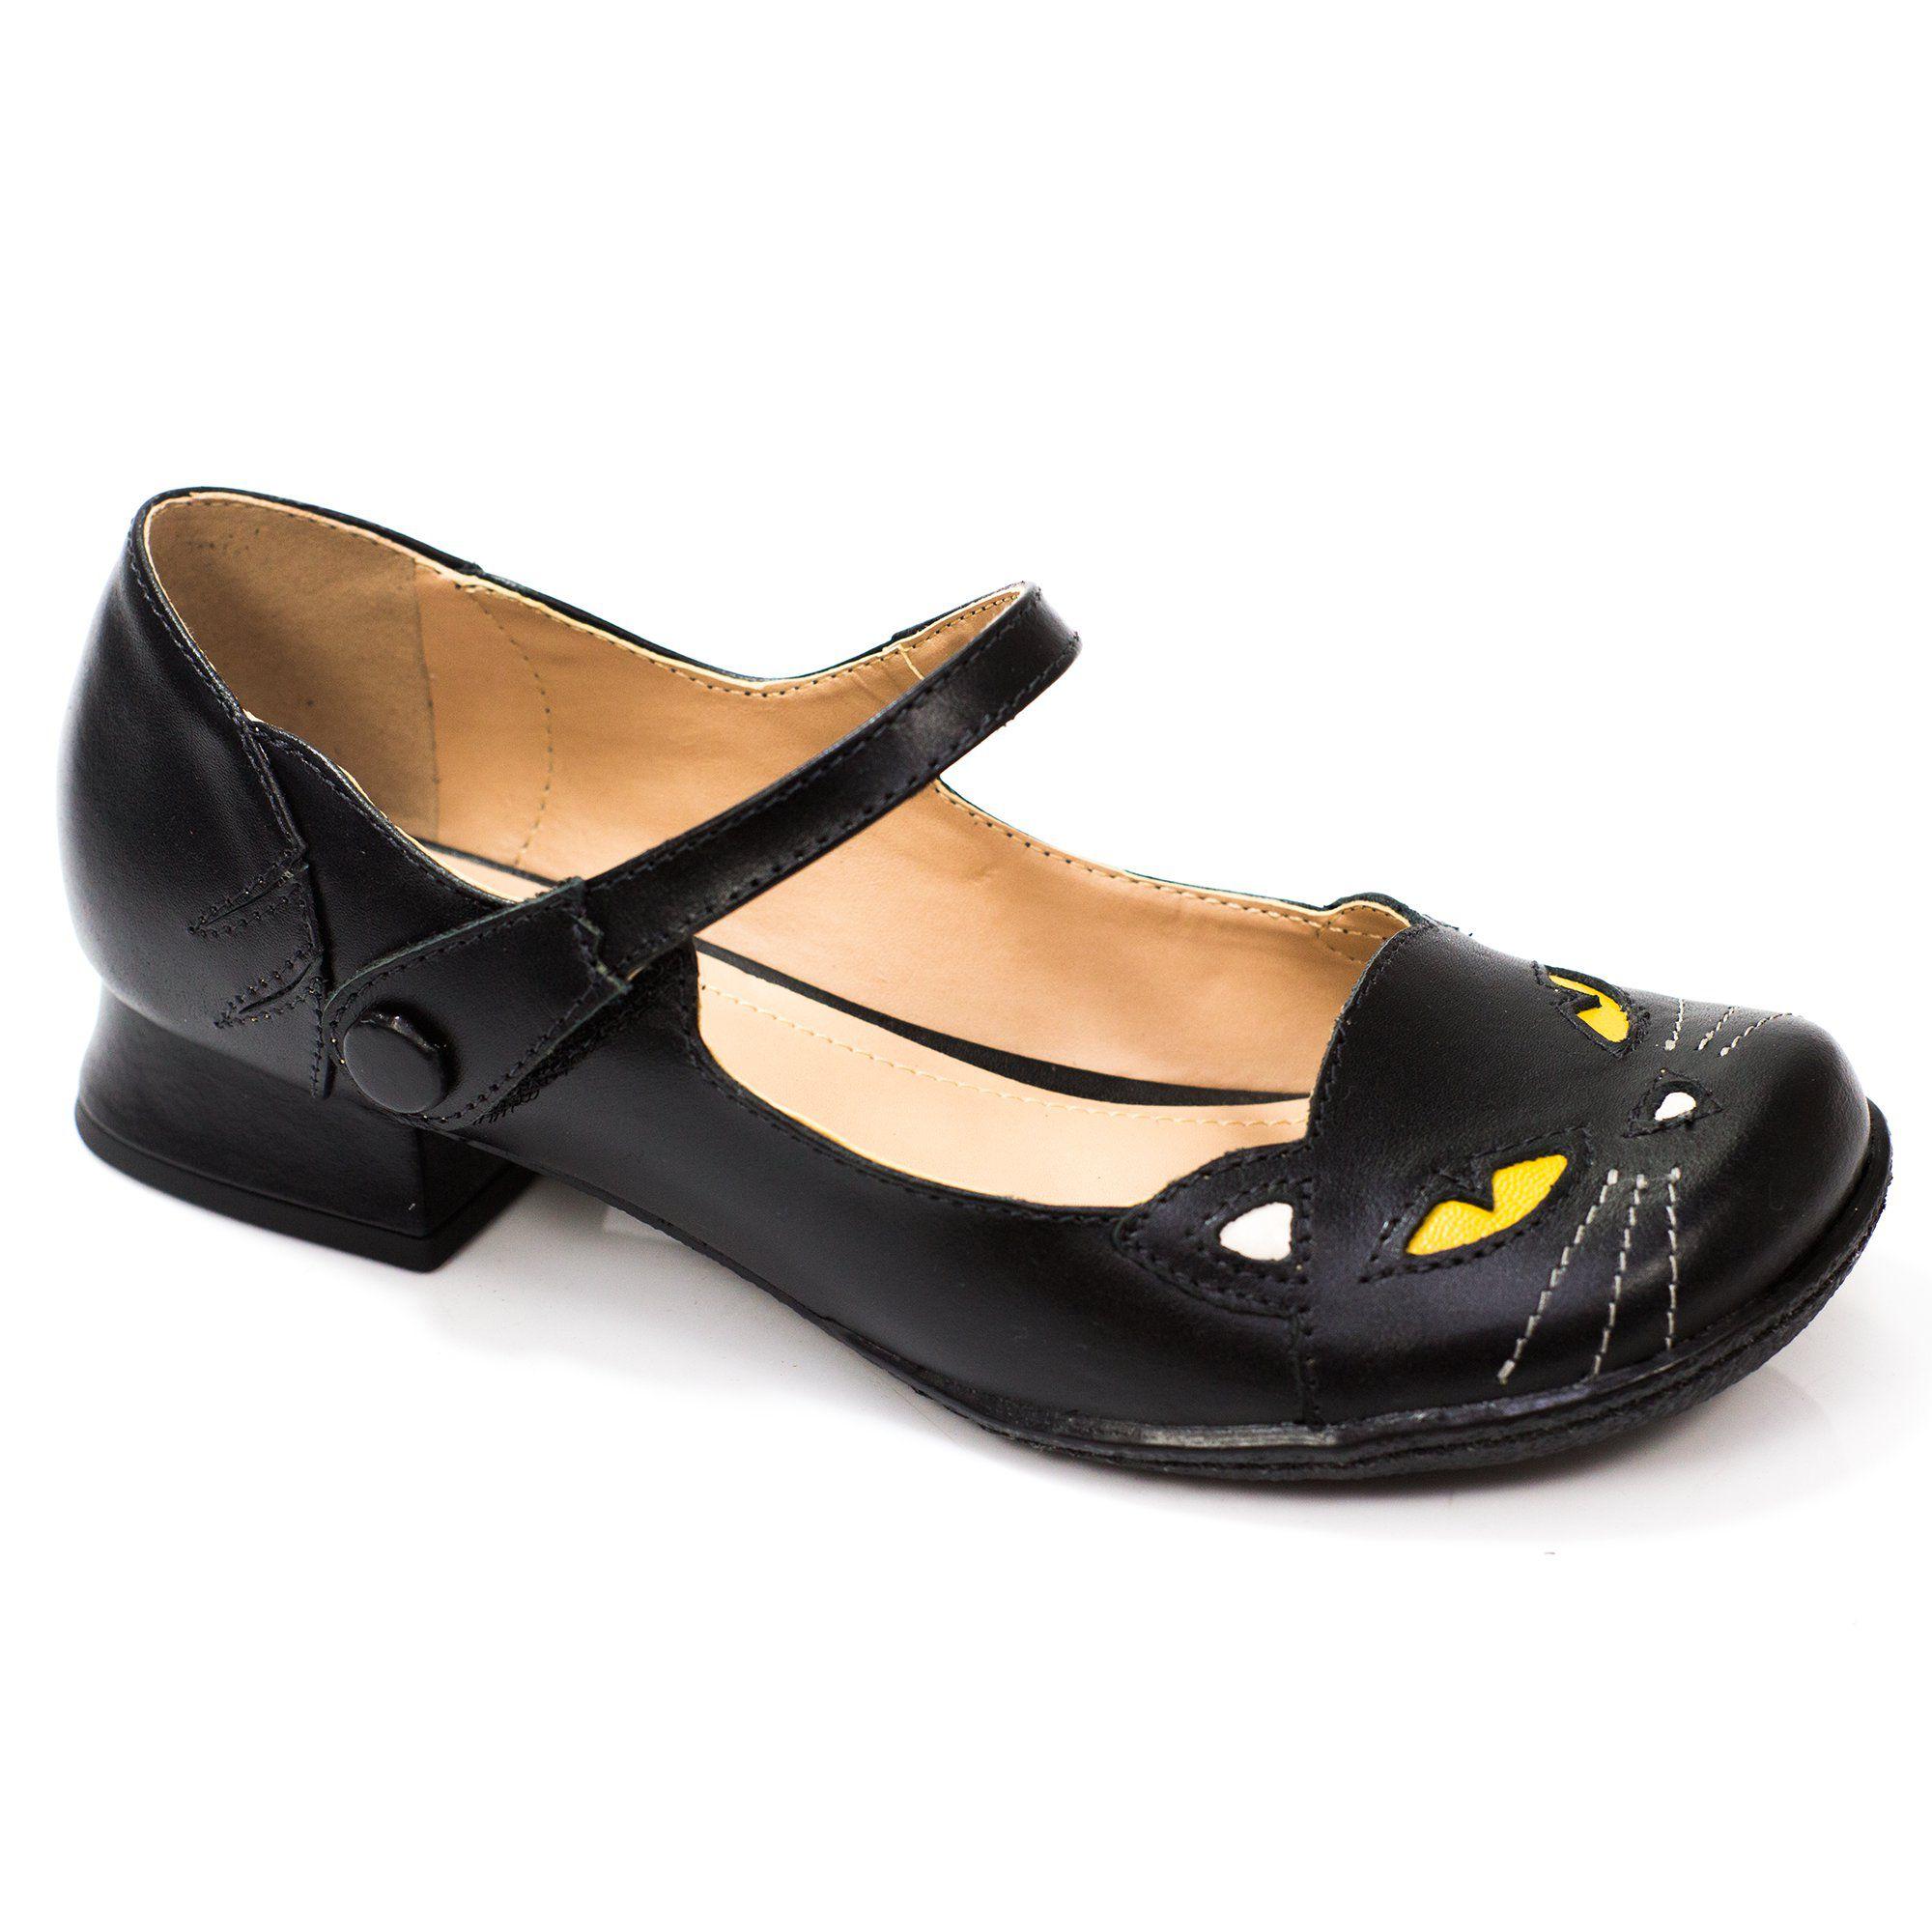 a7f474dd92 Sapatilhas Boneca Retrô ZPZ Shoes